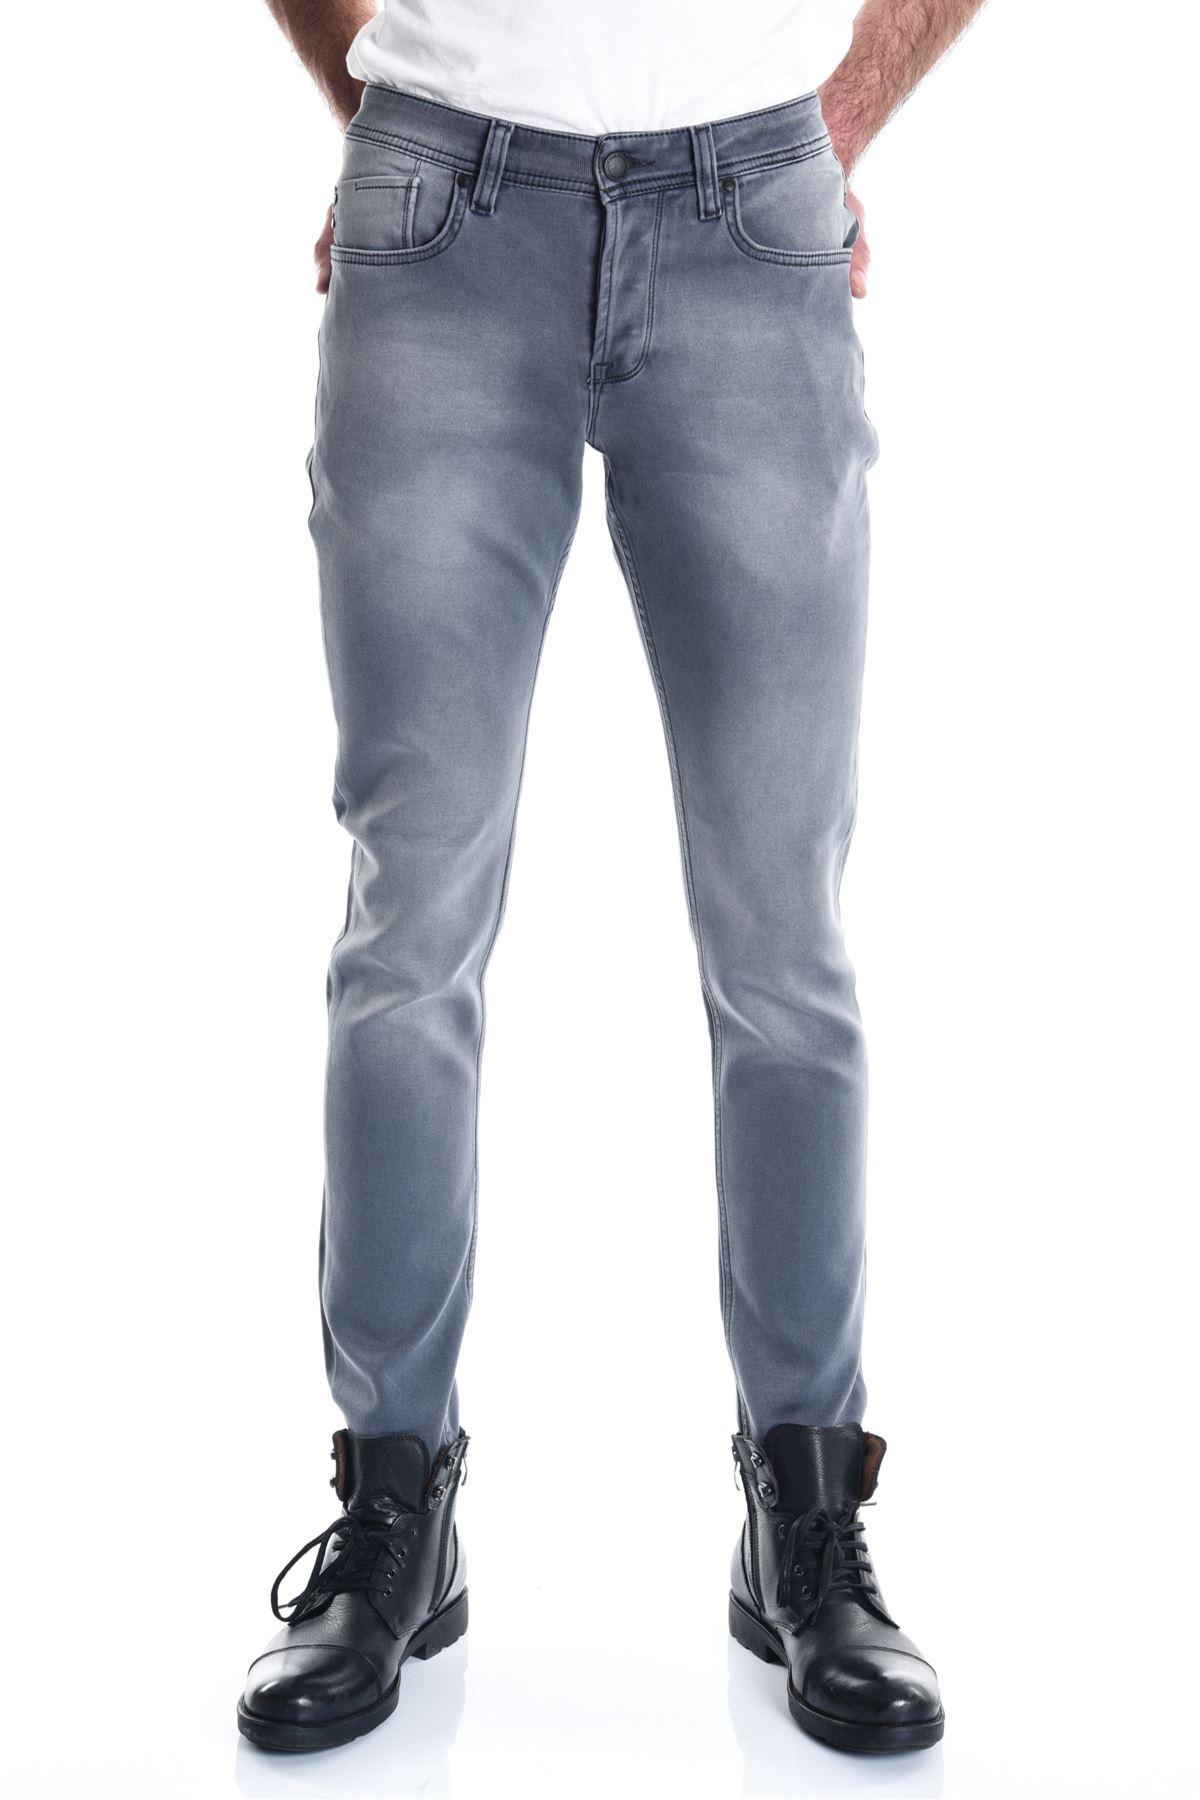 Gri Örme Slimfit Erkek Kot Pantolon